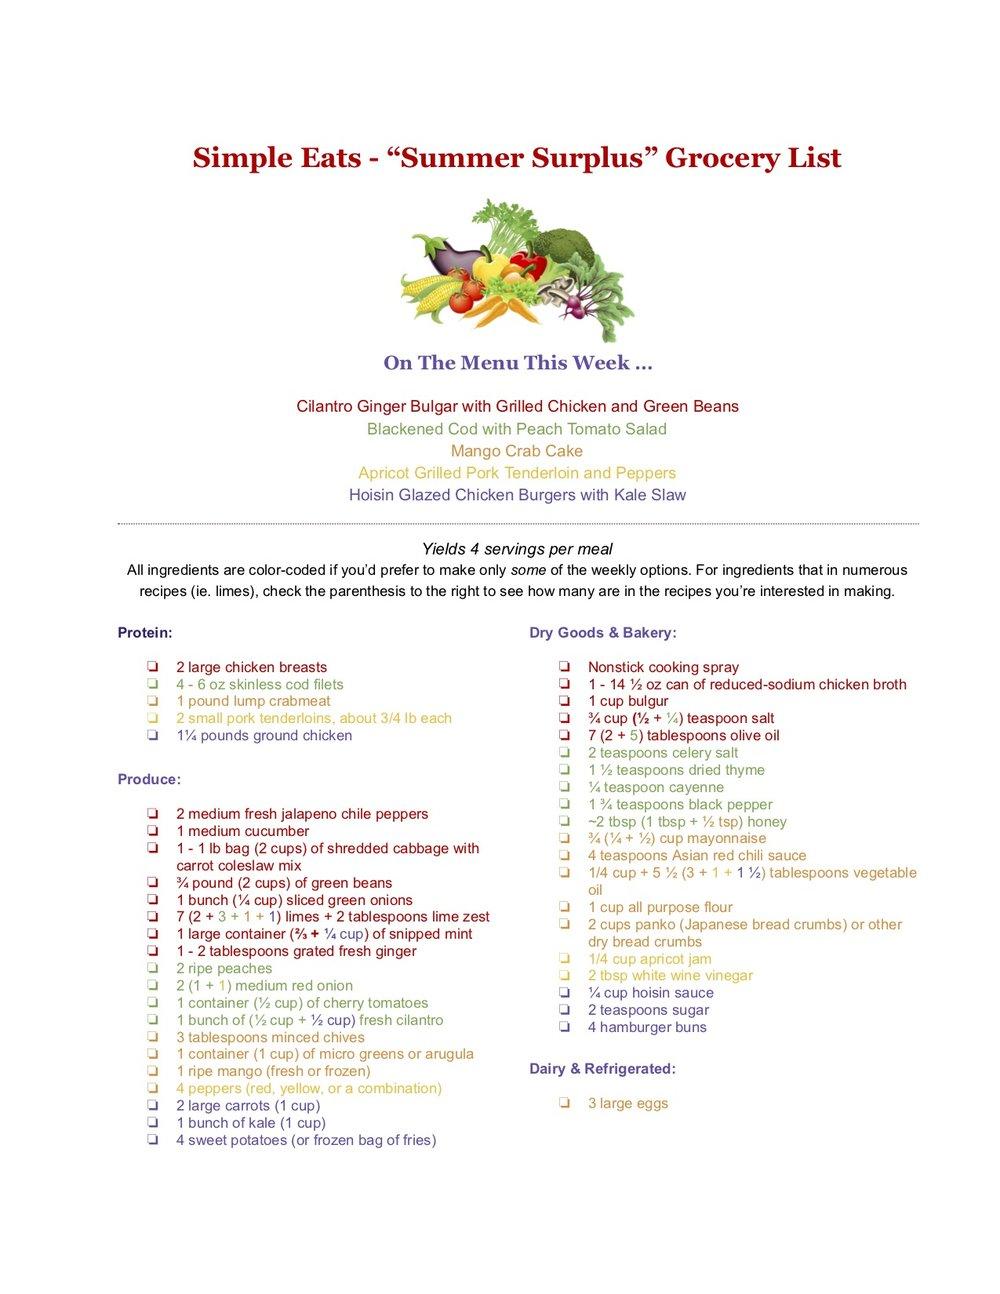 "Simple Eats - ""Summer Surplus"" Grocery List - Google Docs copy.jpg"